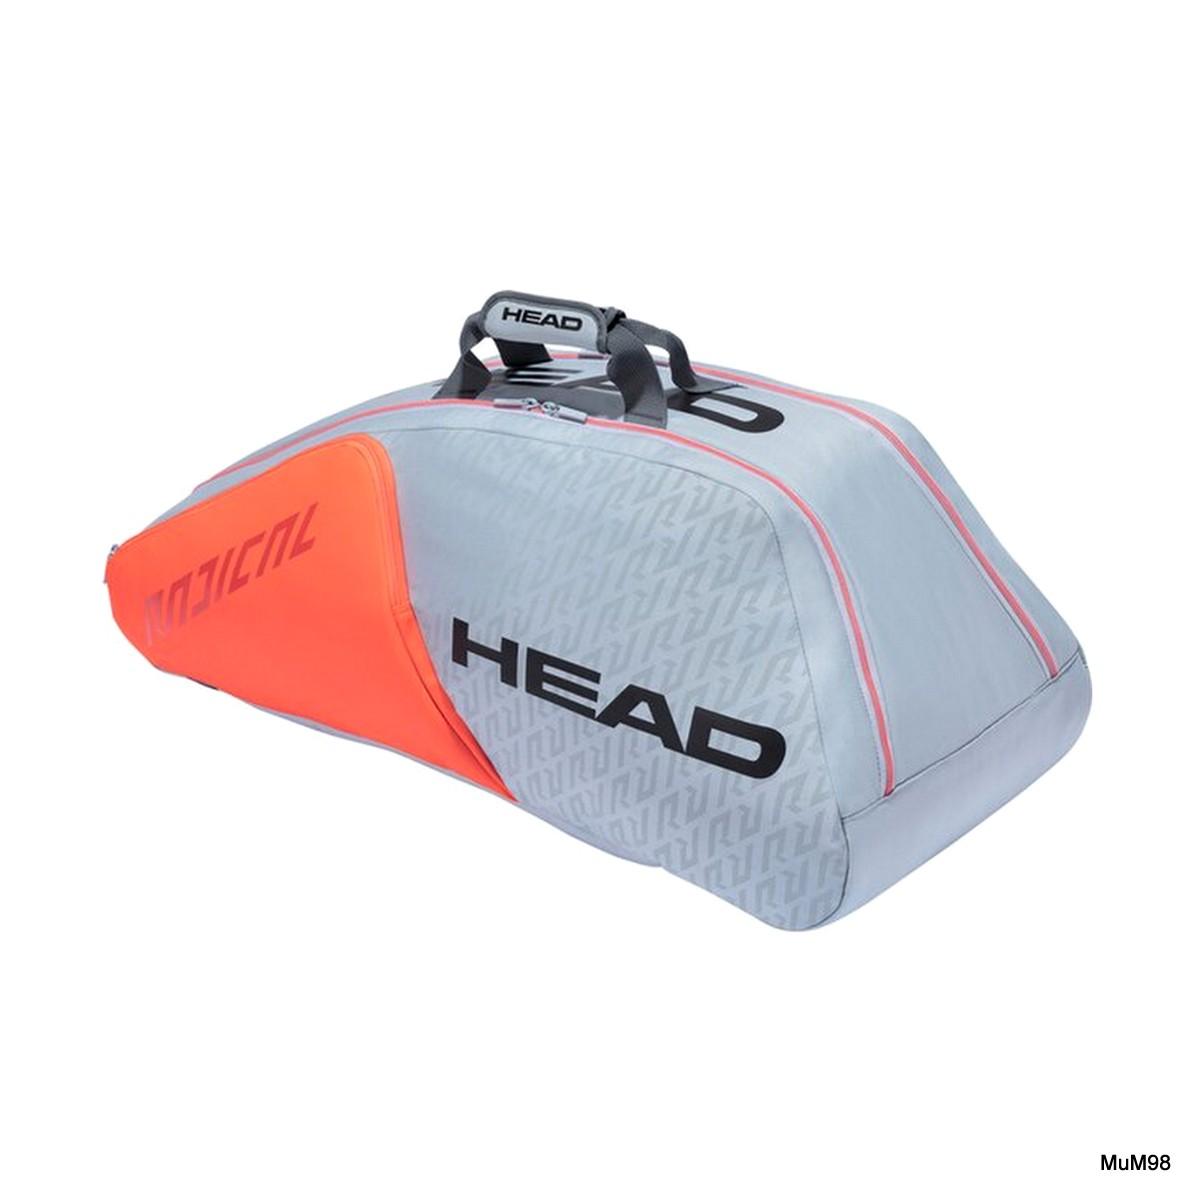 Head Radical 9R Supercombi